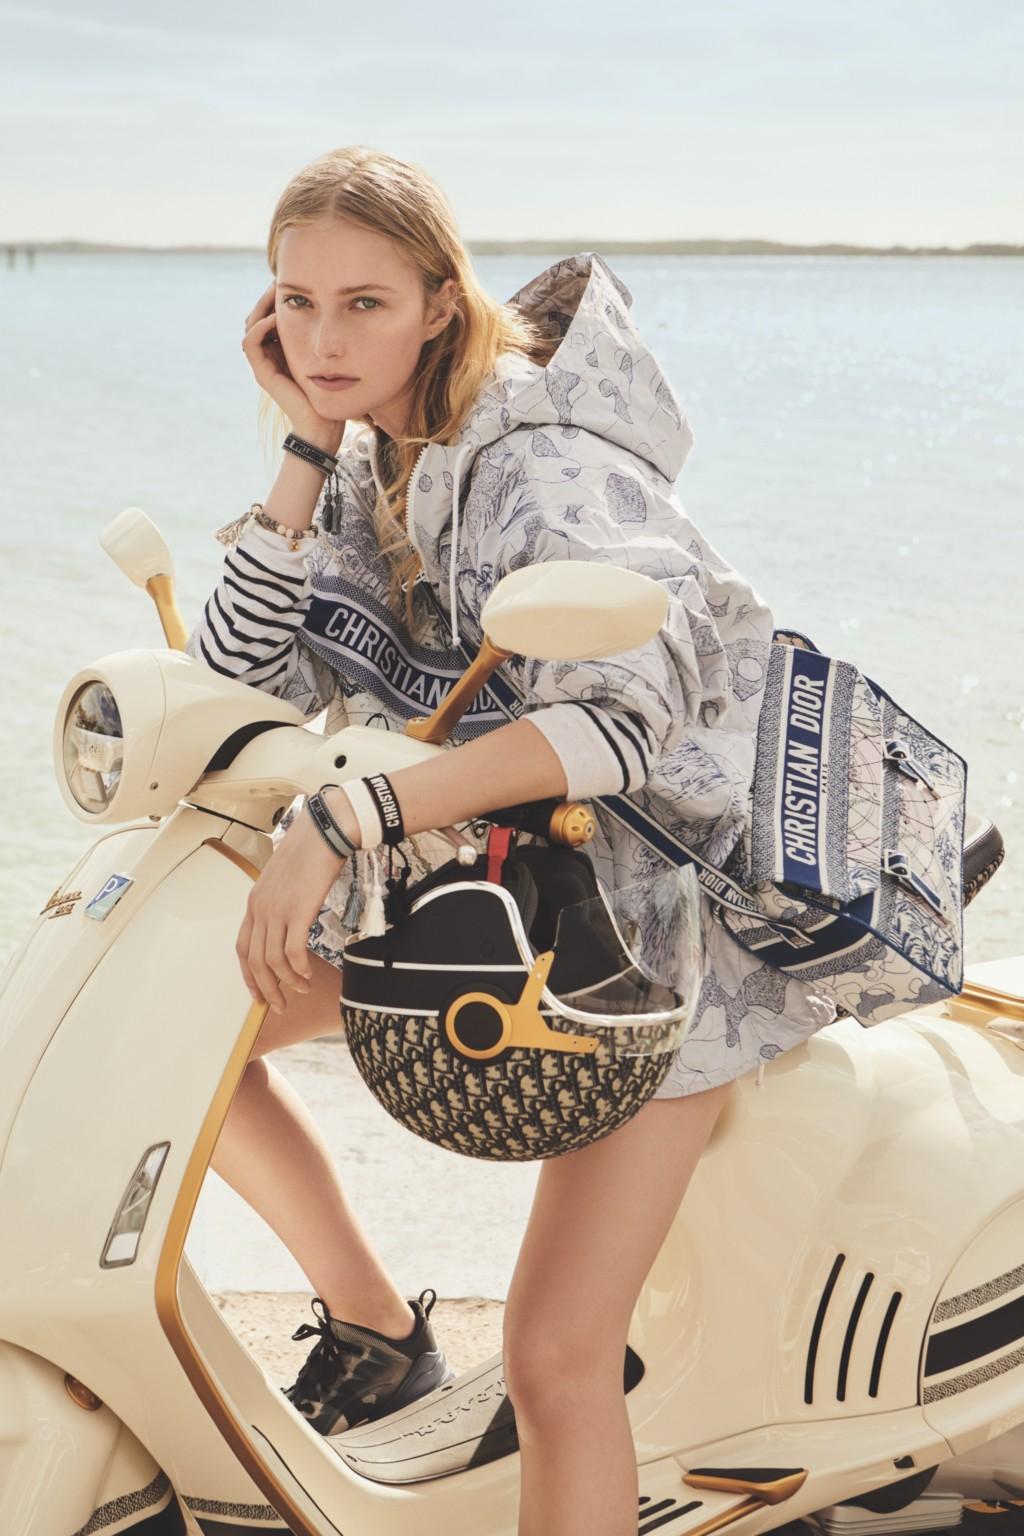 Dior「聯名偉士牌」夢幻車款 販售點「一次曝光」台灣買得到!